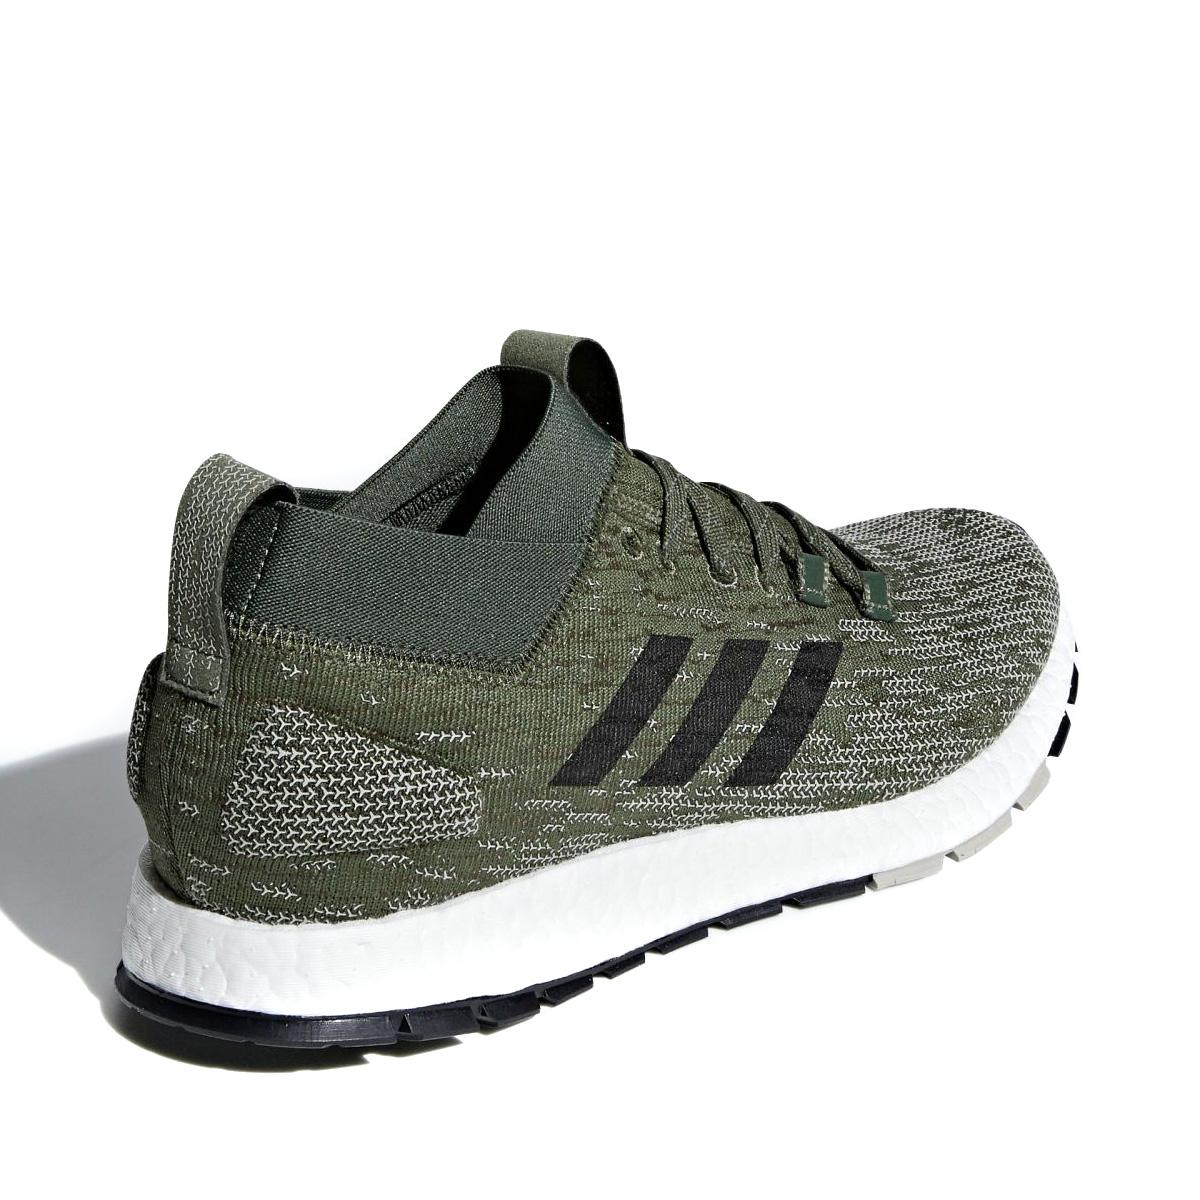 Adidas Pureboost RBL